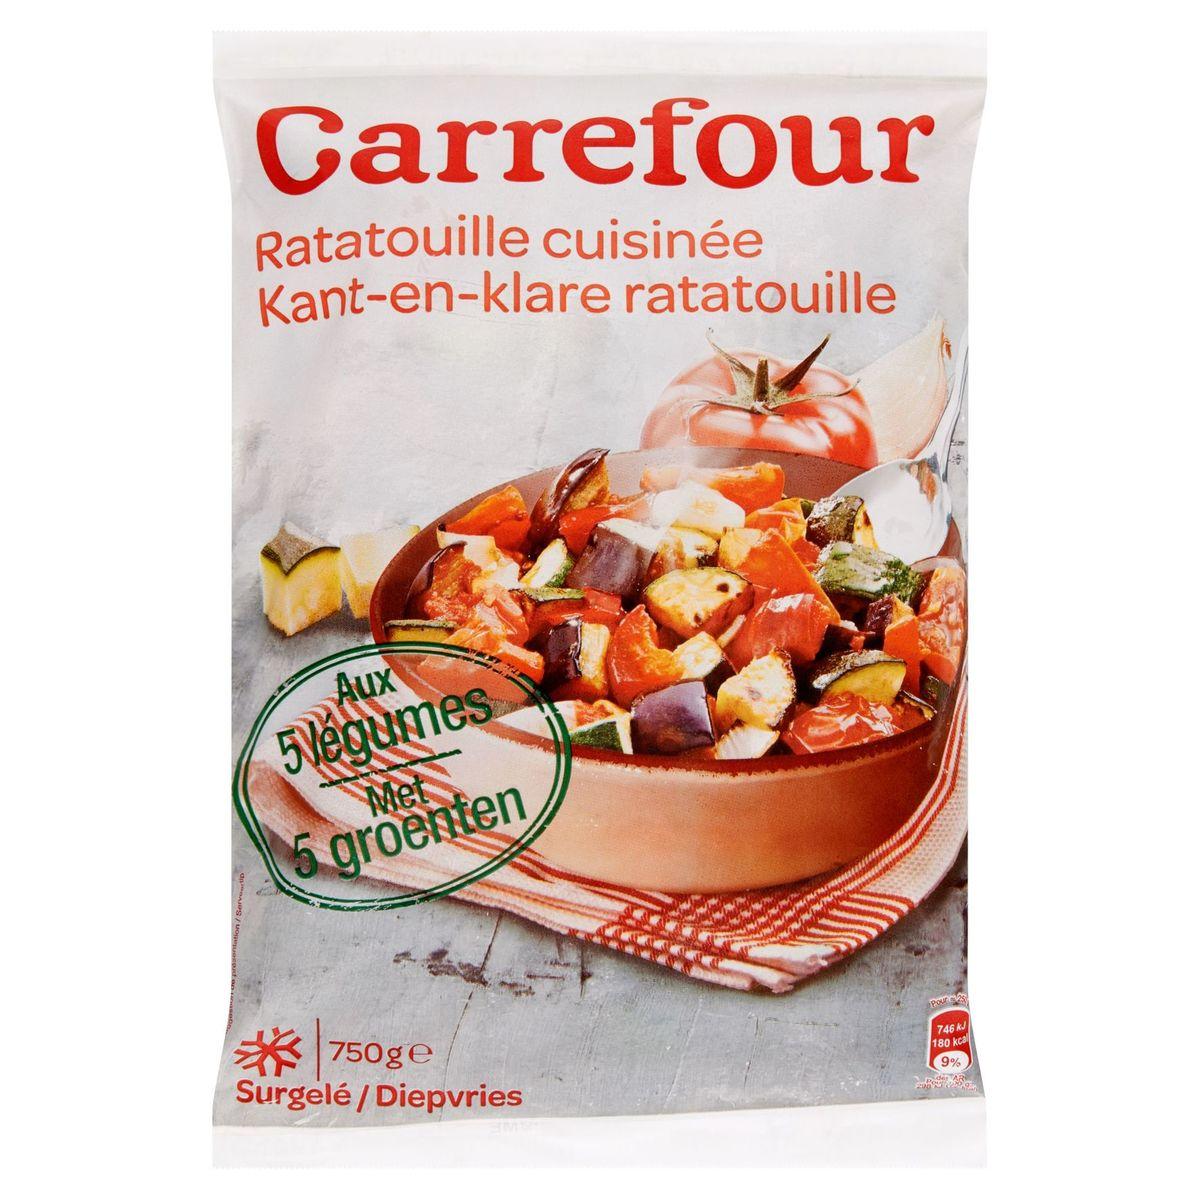 Carrefour Kant-en-Klare Ratatouille met 5 Groenten 750 g